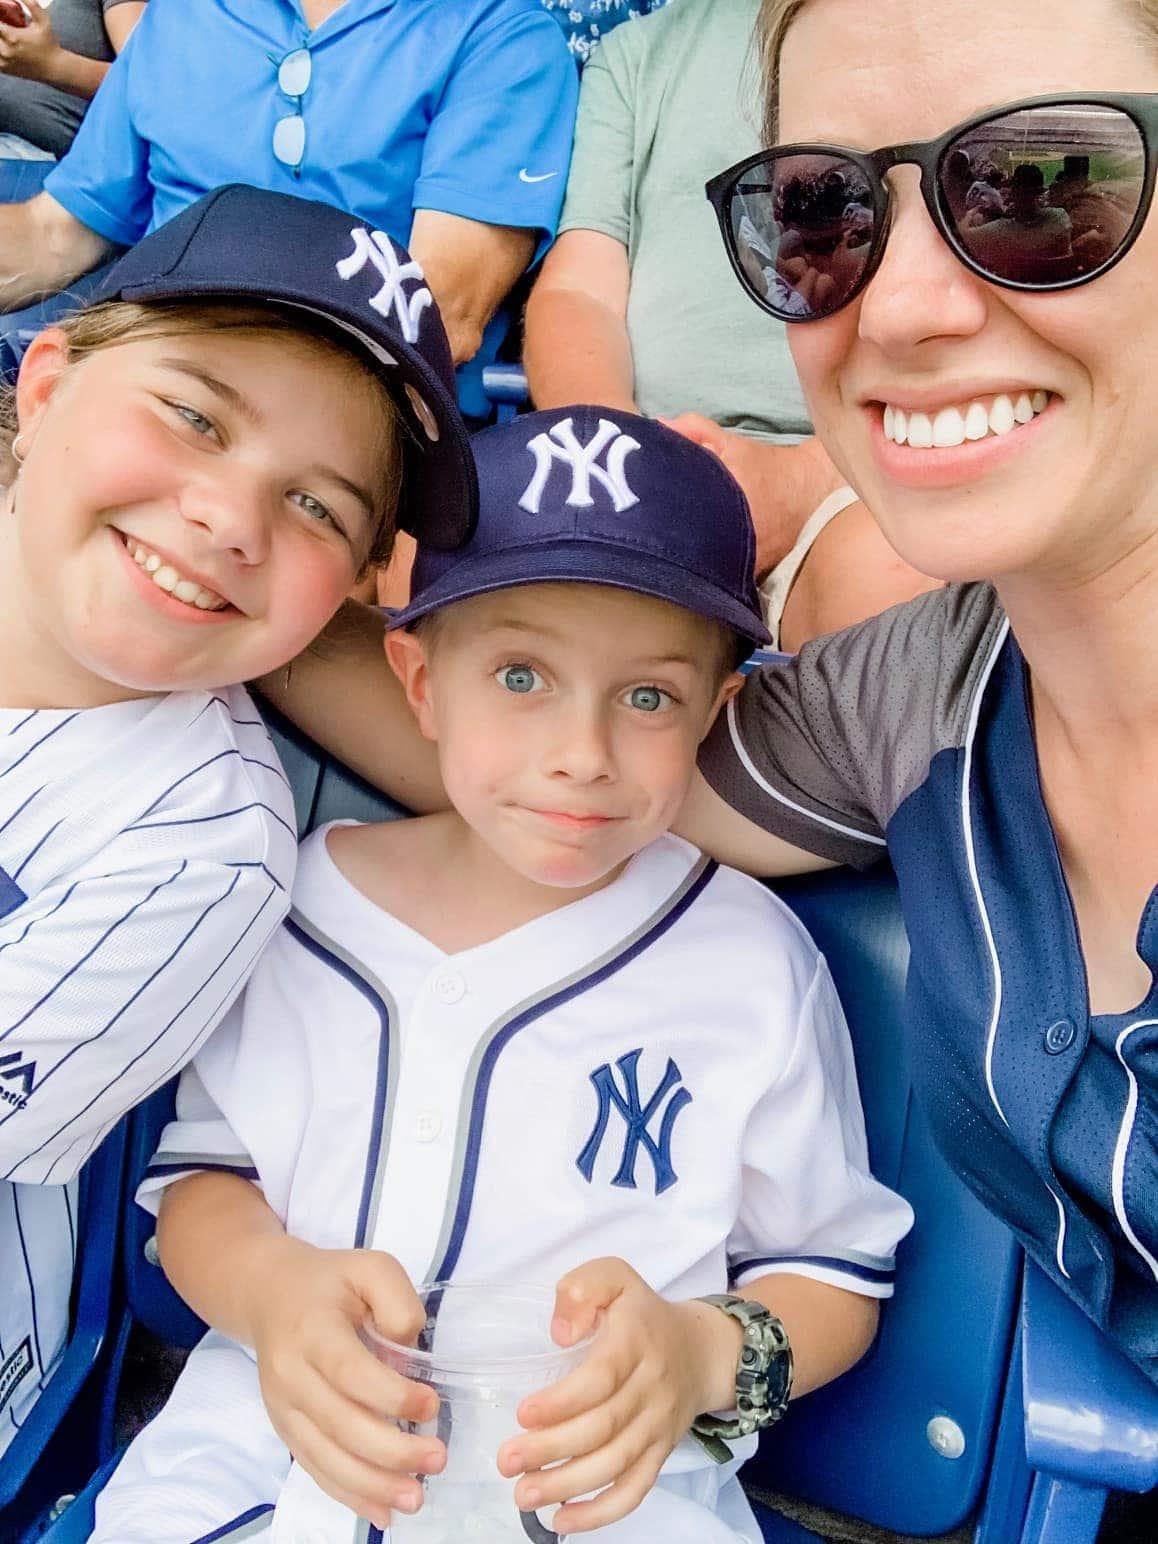 Brooke, Blake and Lauren at a baseball game